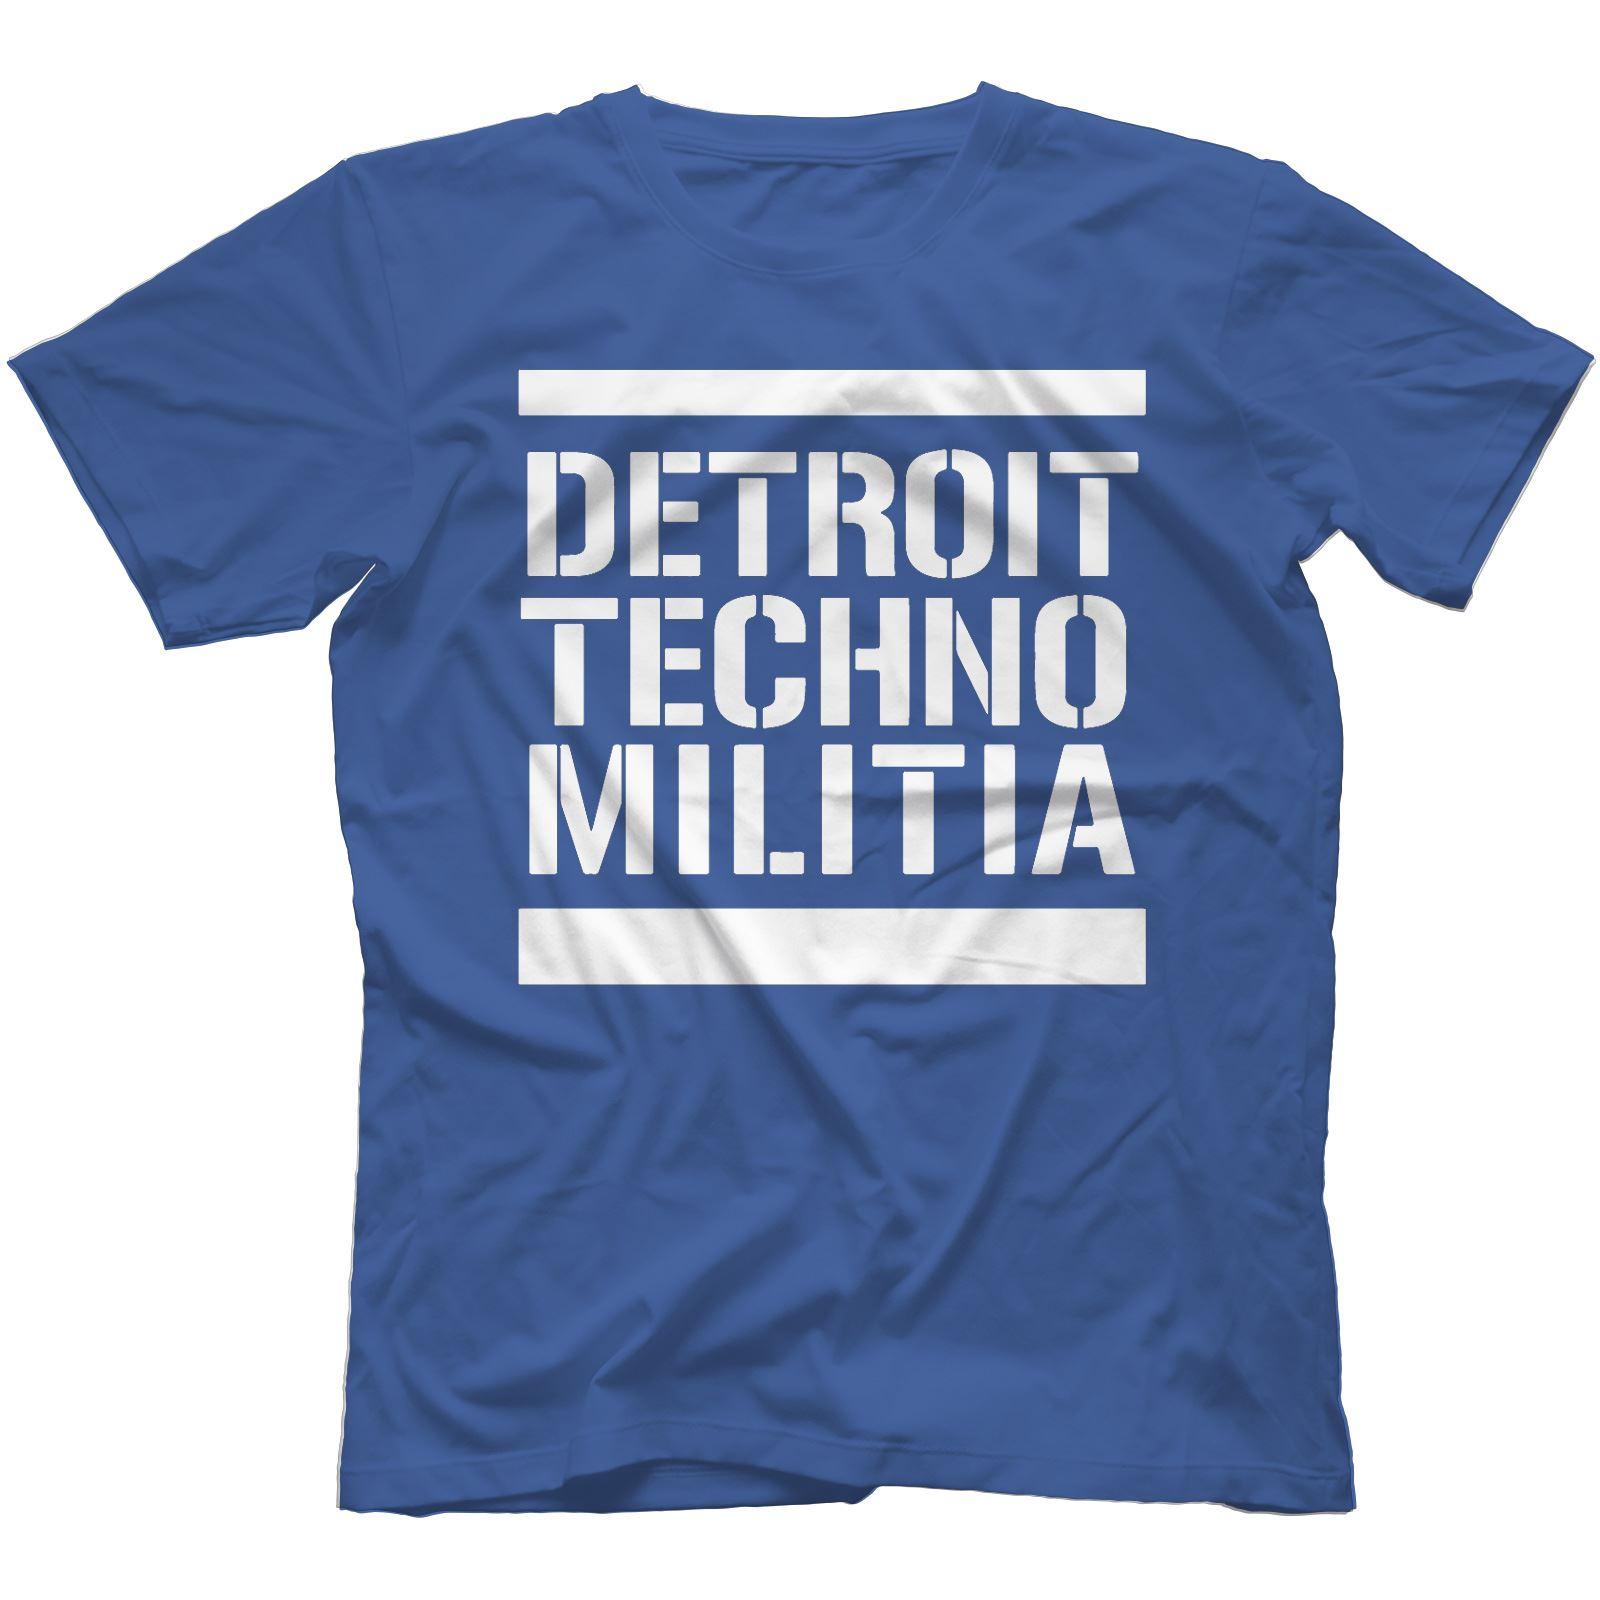 Detroit-Techno-Militia-T-Shirt-100-Cotton-Vinyl-909-Underground-Resistance Indexbild 37